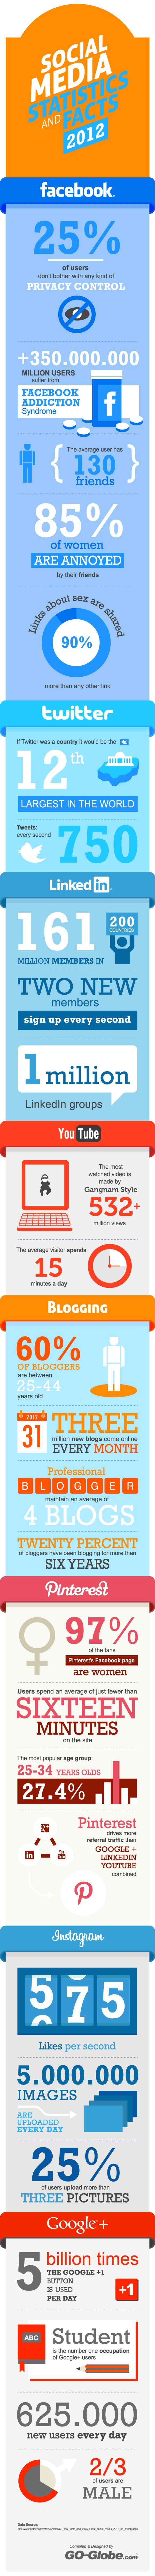 Social-media-statistics-and-facts-2012